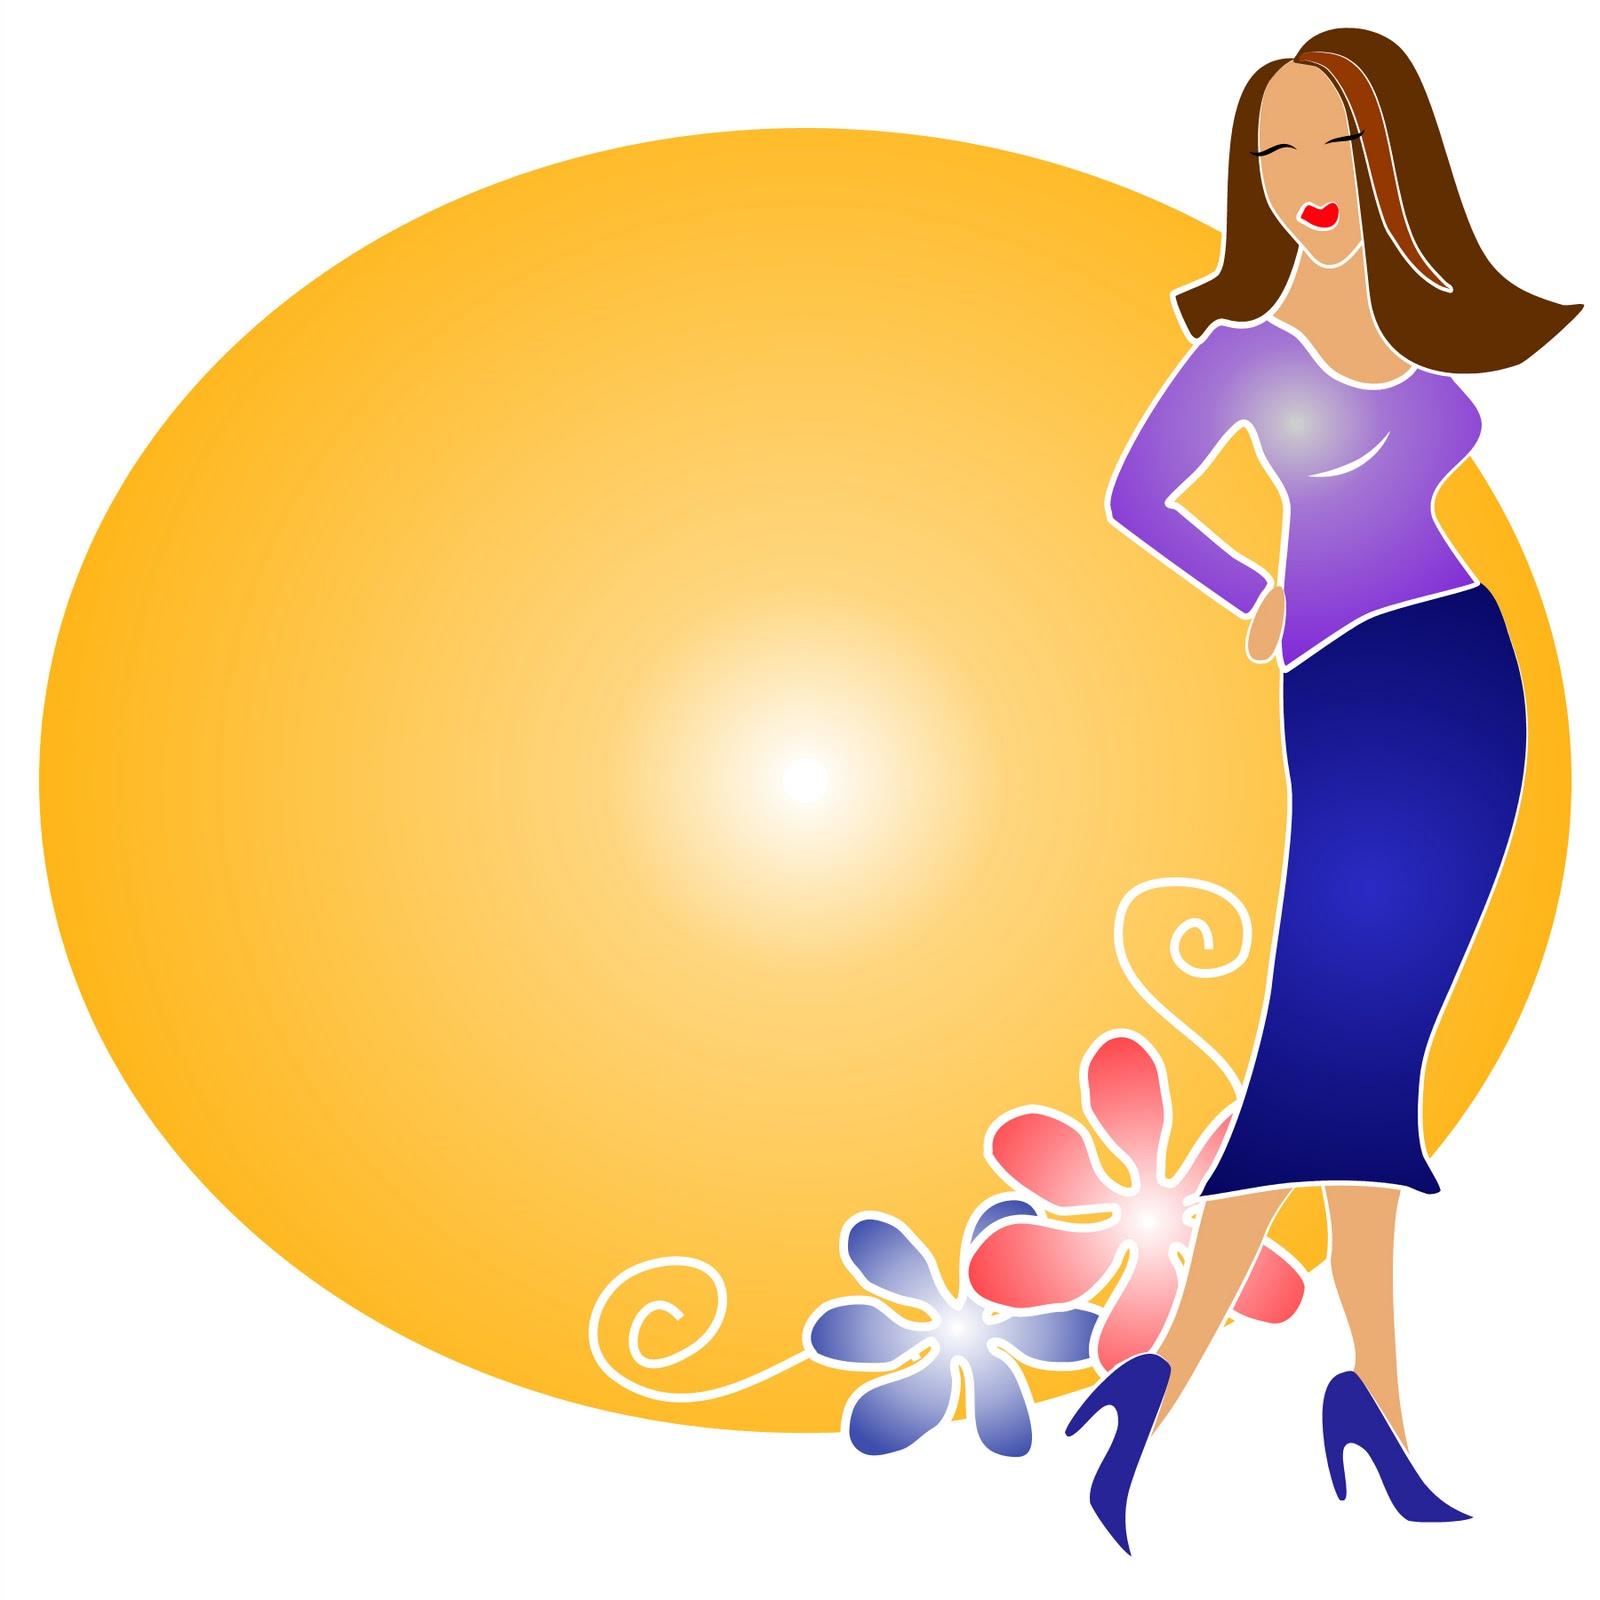 http://1.bp.blogspot.com/_eSDGPcdBv98/TM7PfMmn3ZI/AAAAAAAABPI/ZjvXSLnuOzo/s1600/dreamstimefree_2794780.jpg